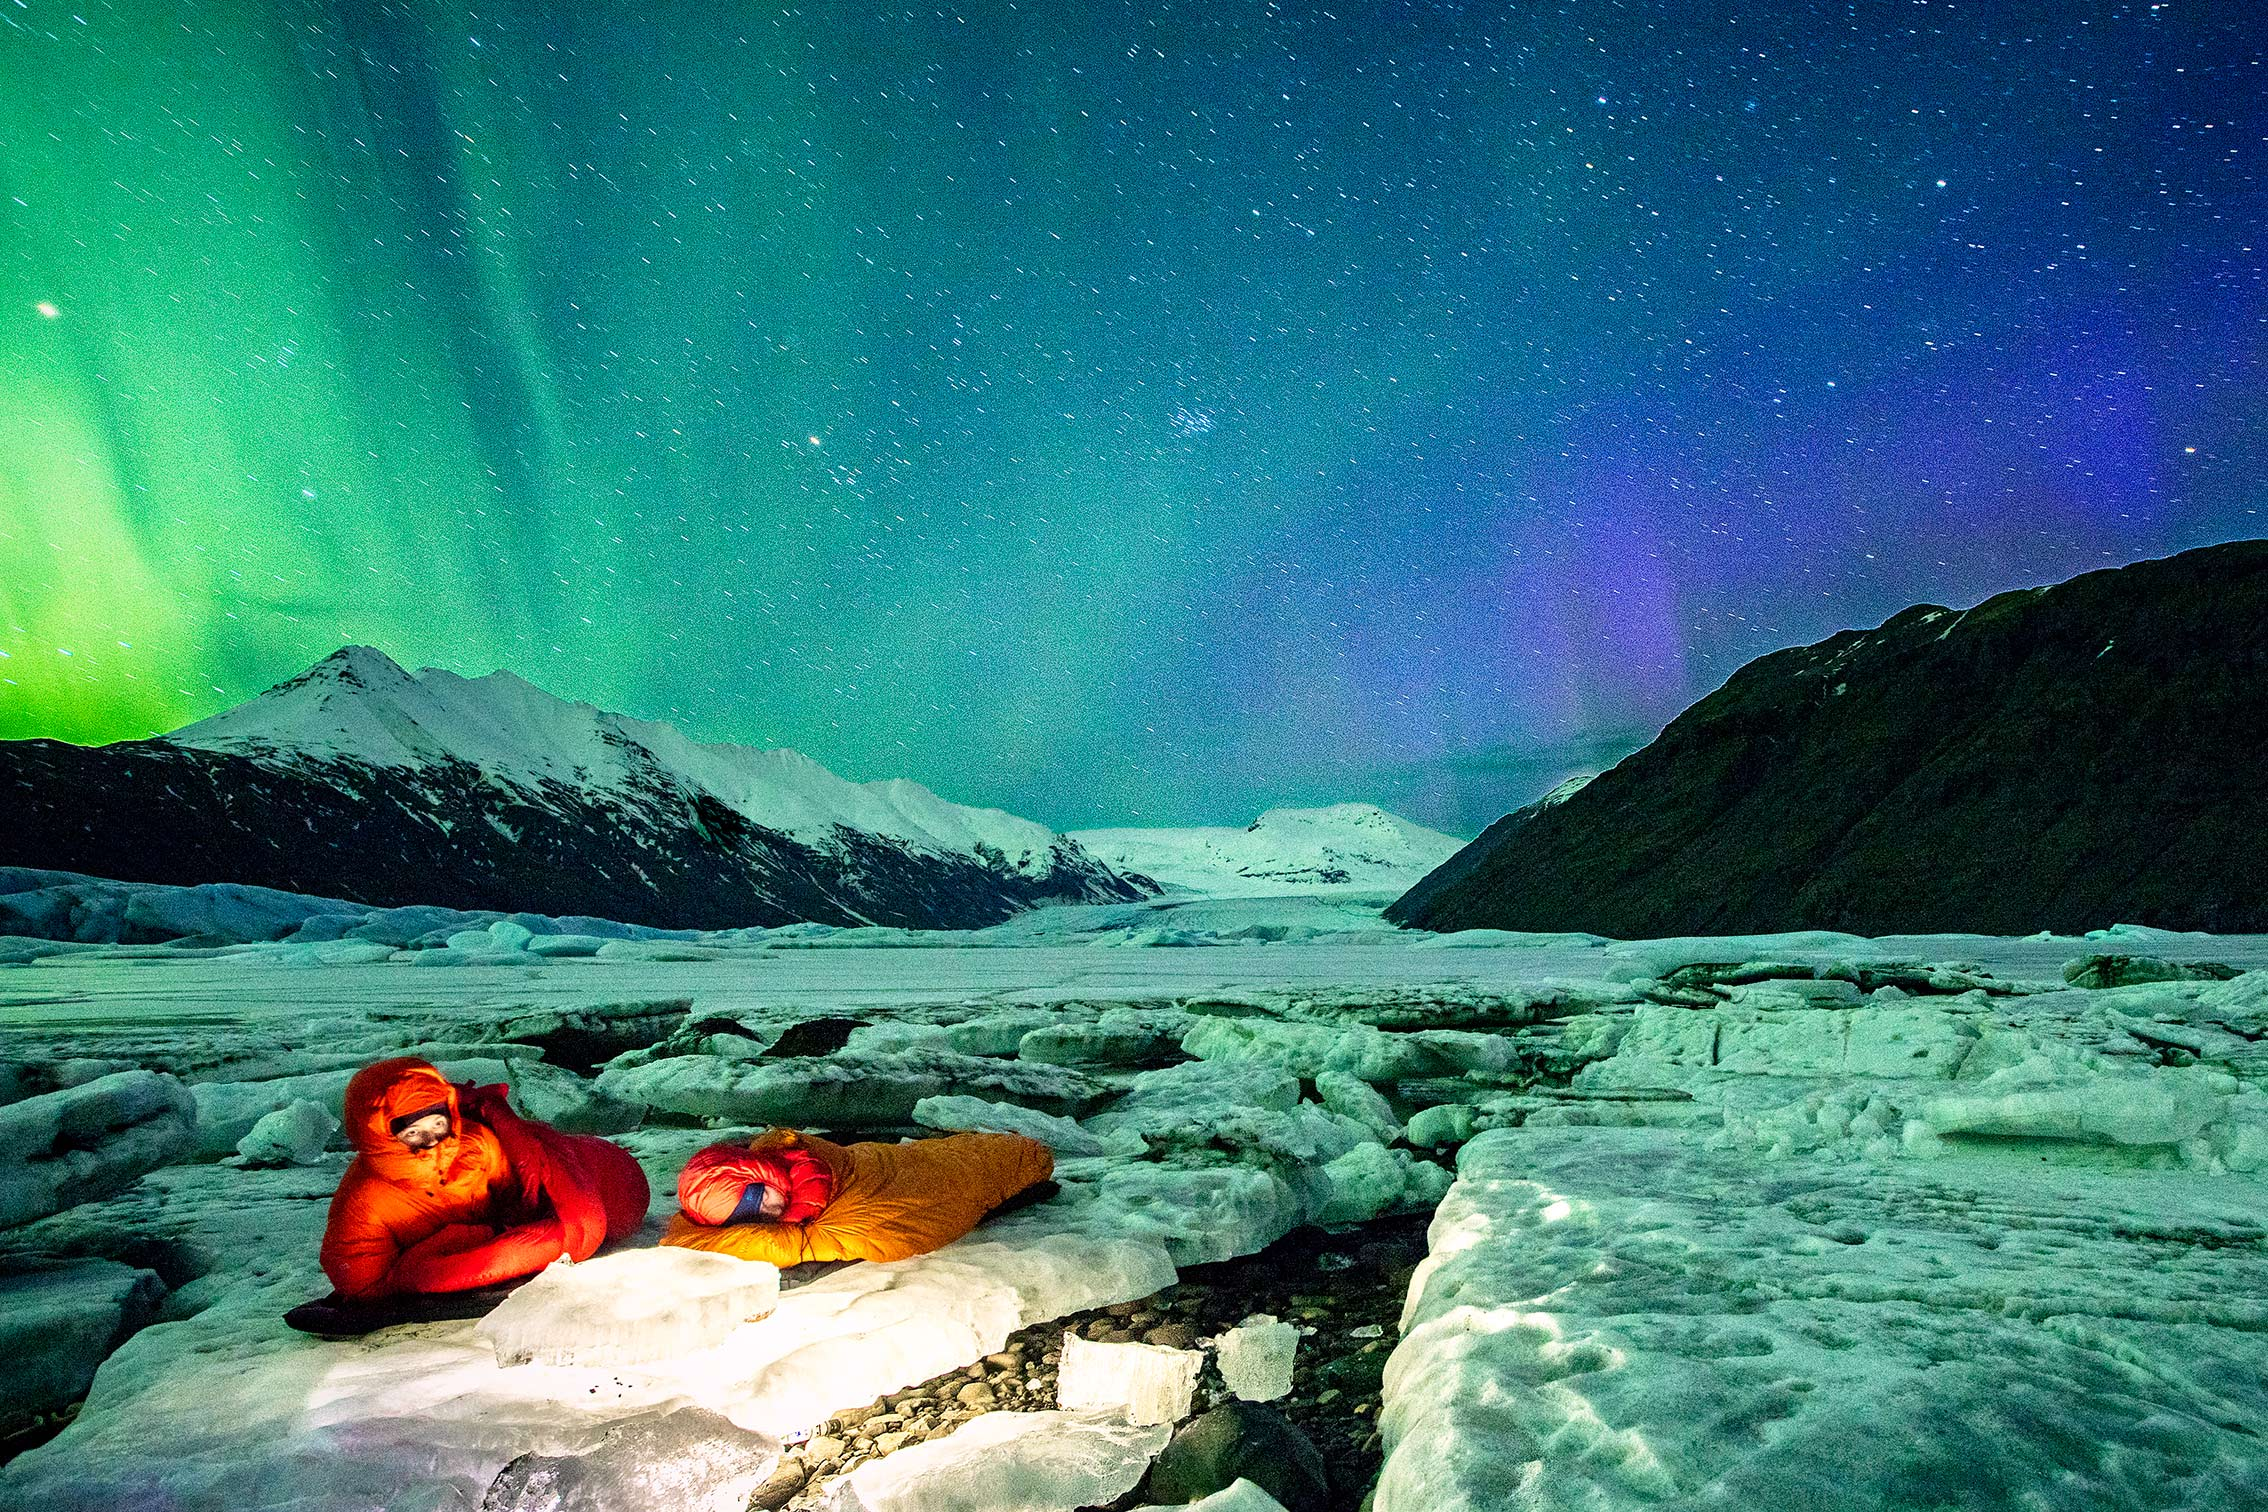 ©KontraPixel – sleeping underneath the aurora borealis / northern lights